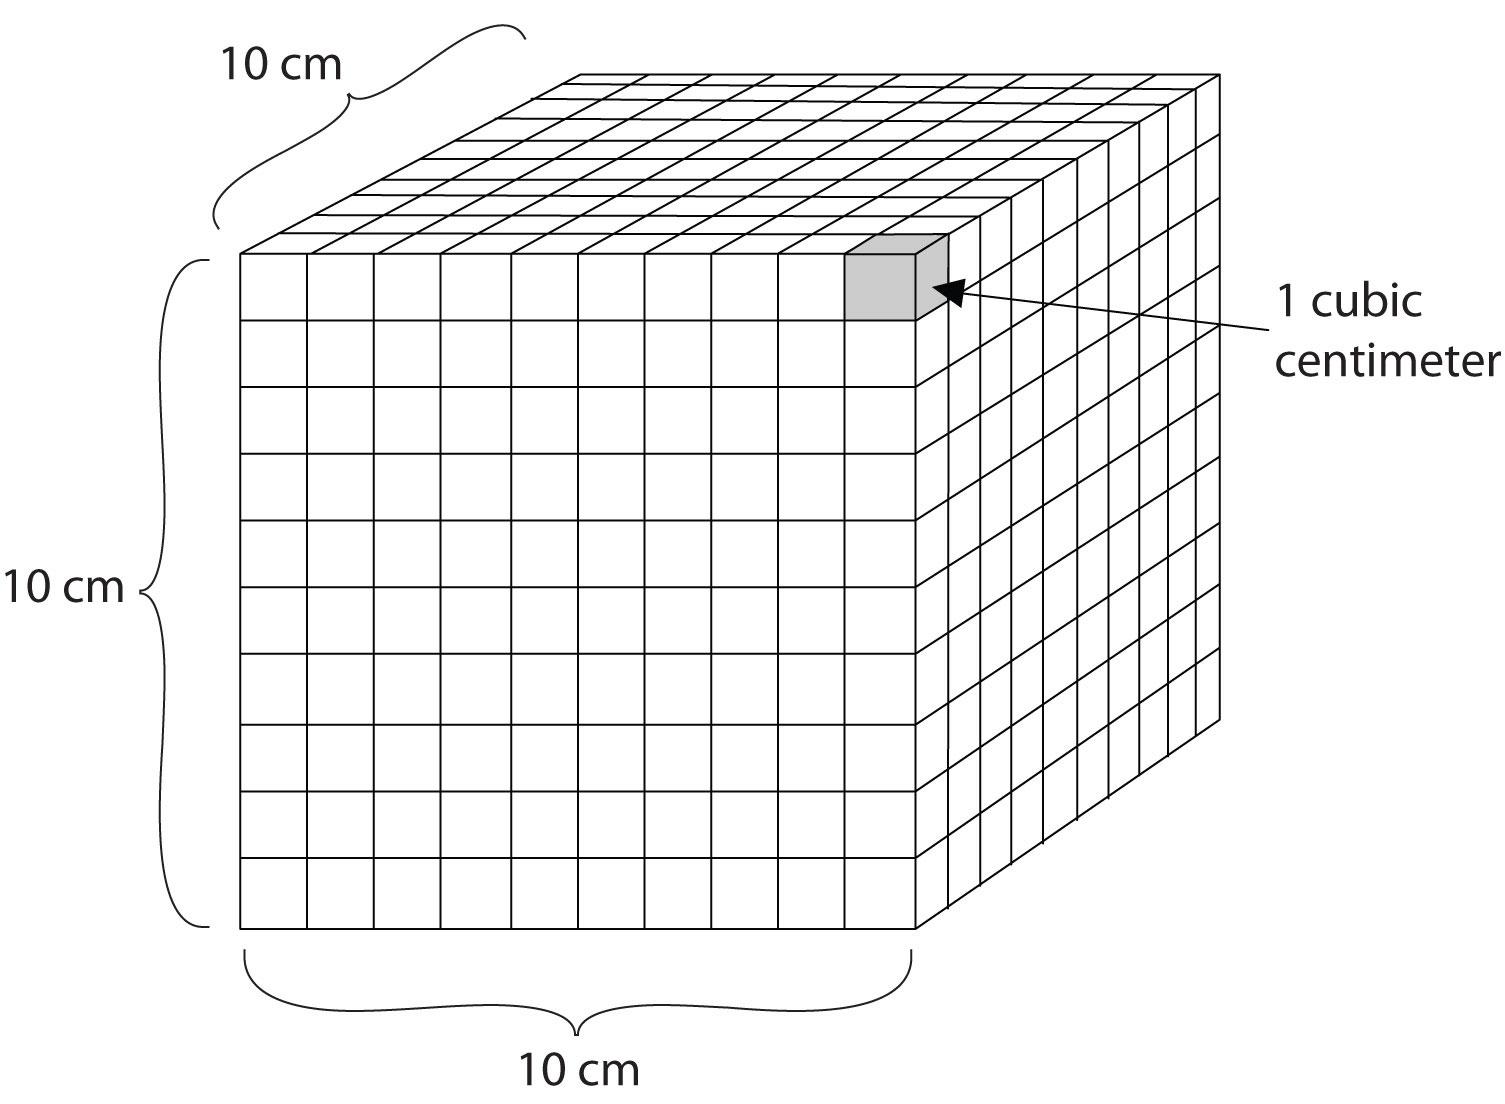 Convert Centimeters To Meters